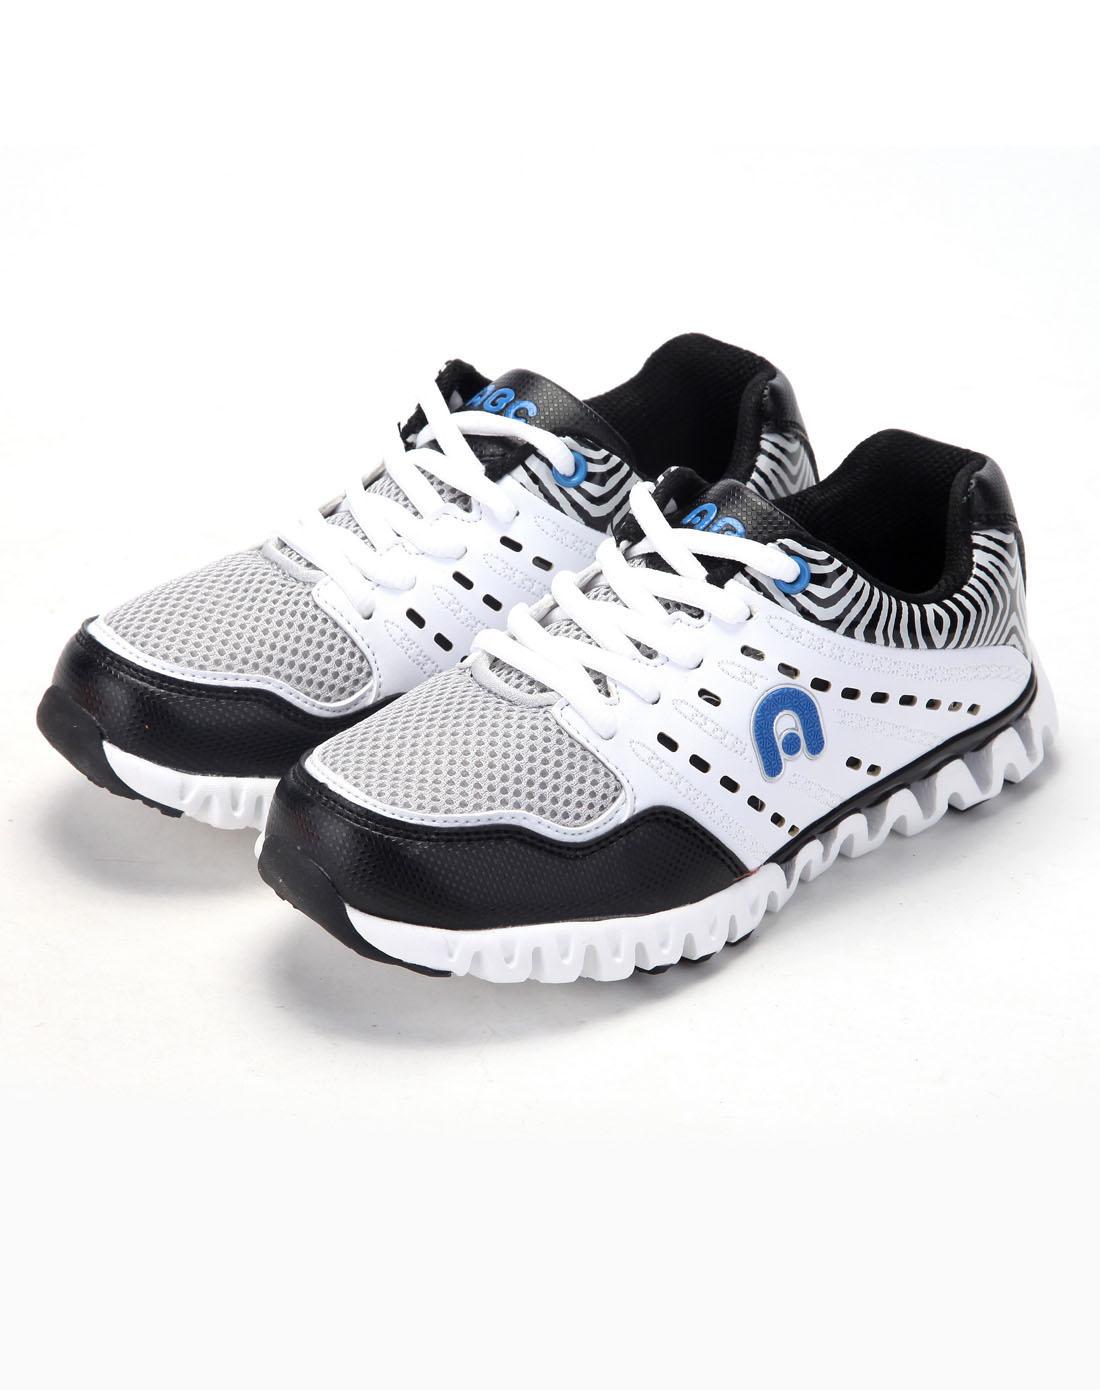 abckids男女童鞋男中童白/黑跑步运动鞋y2333310d